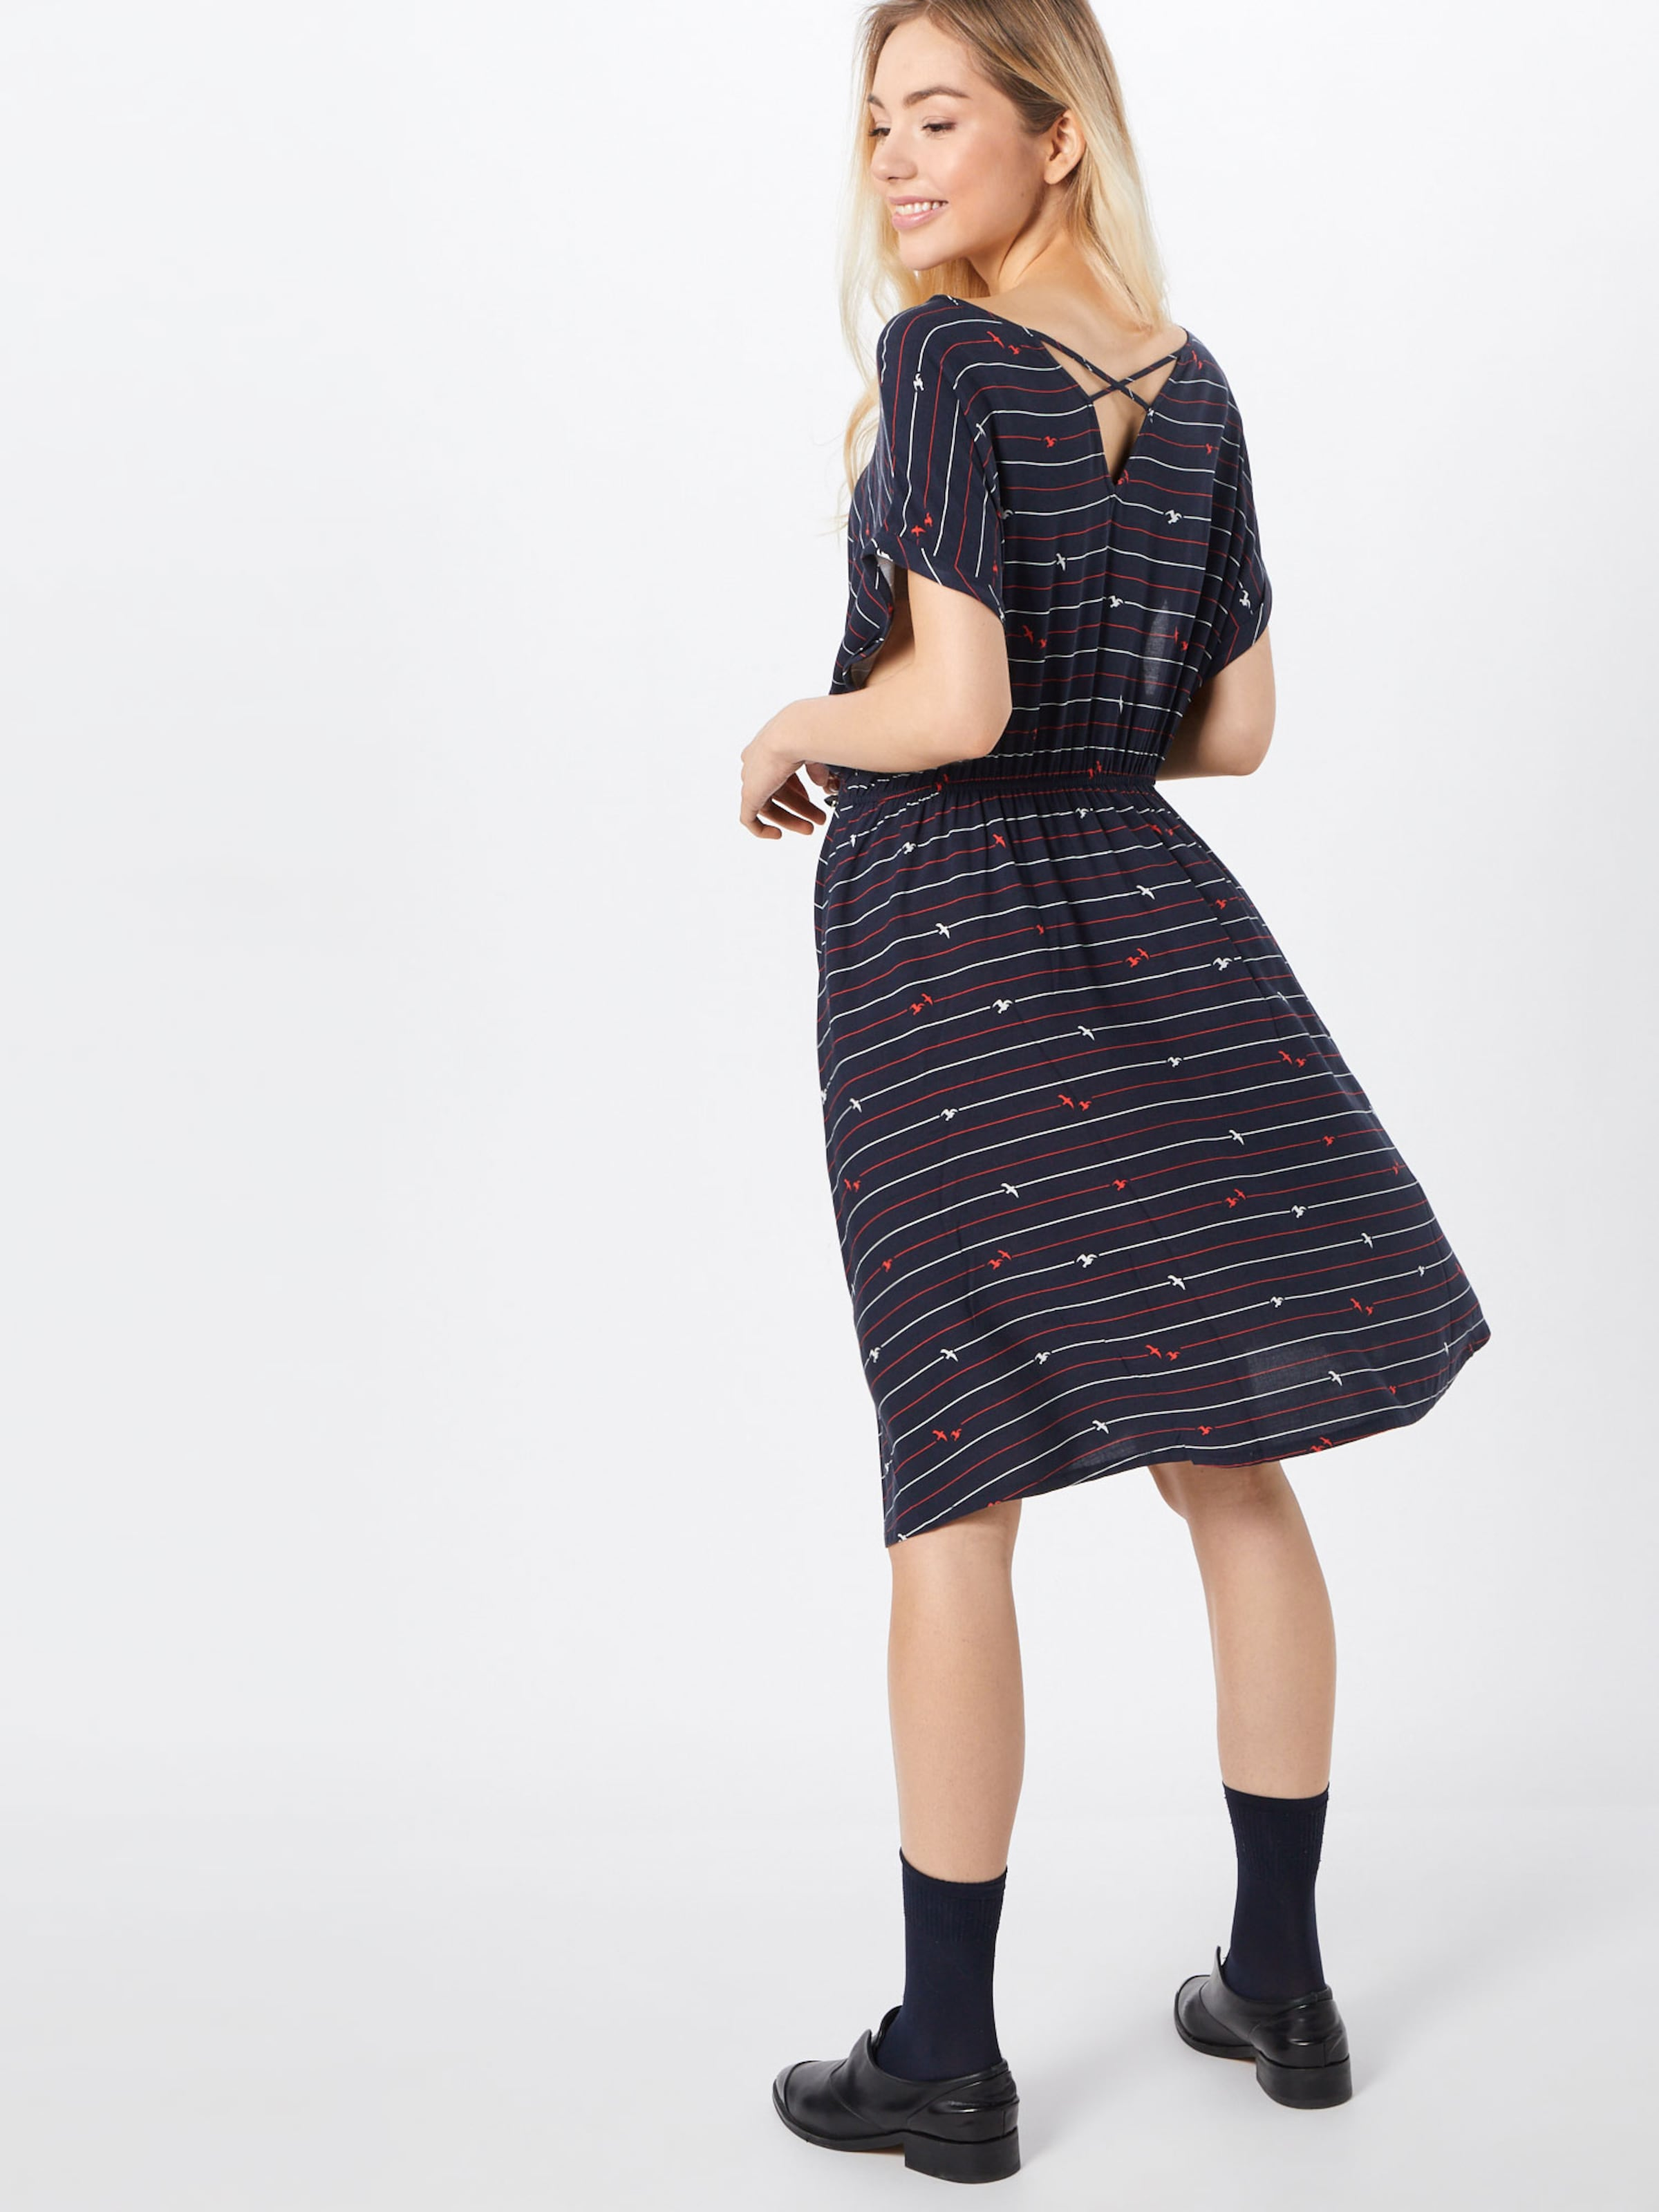 Tailor Bleu En Tom Print Dress' WomenRobe 'casual OuPTkXZi